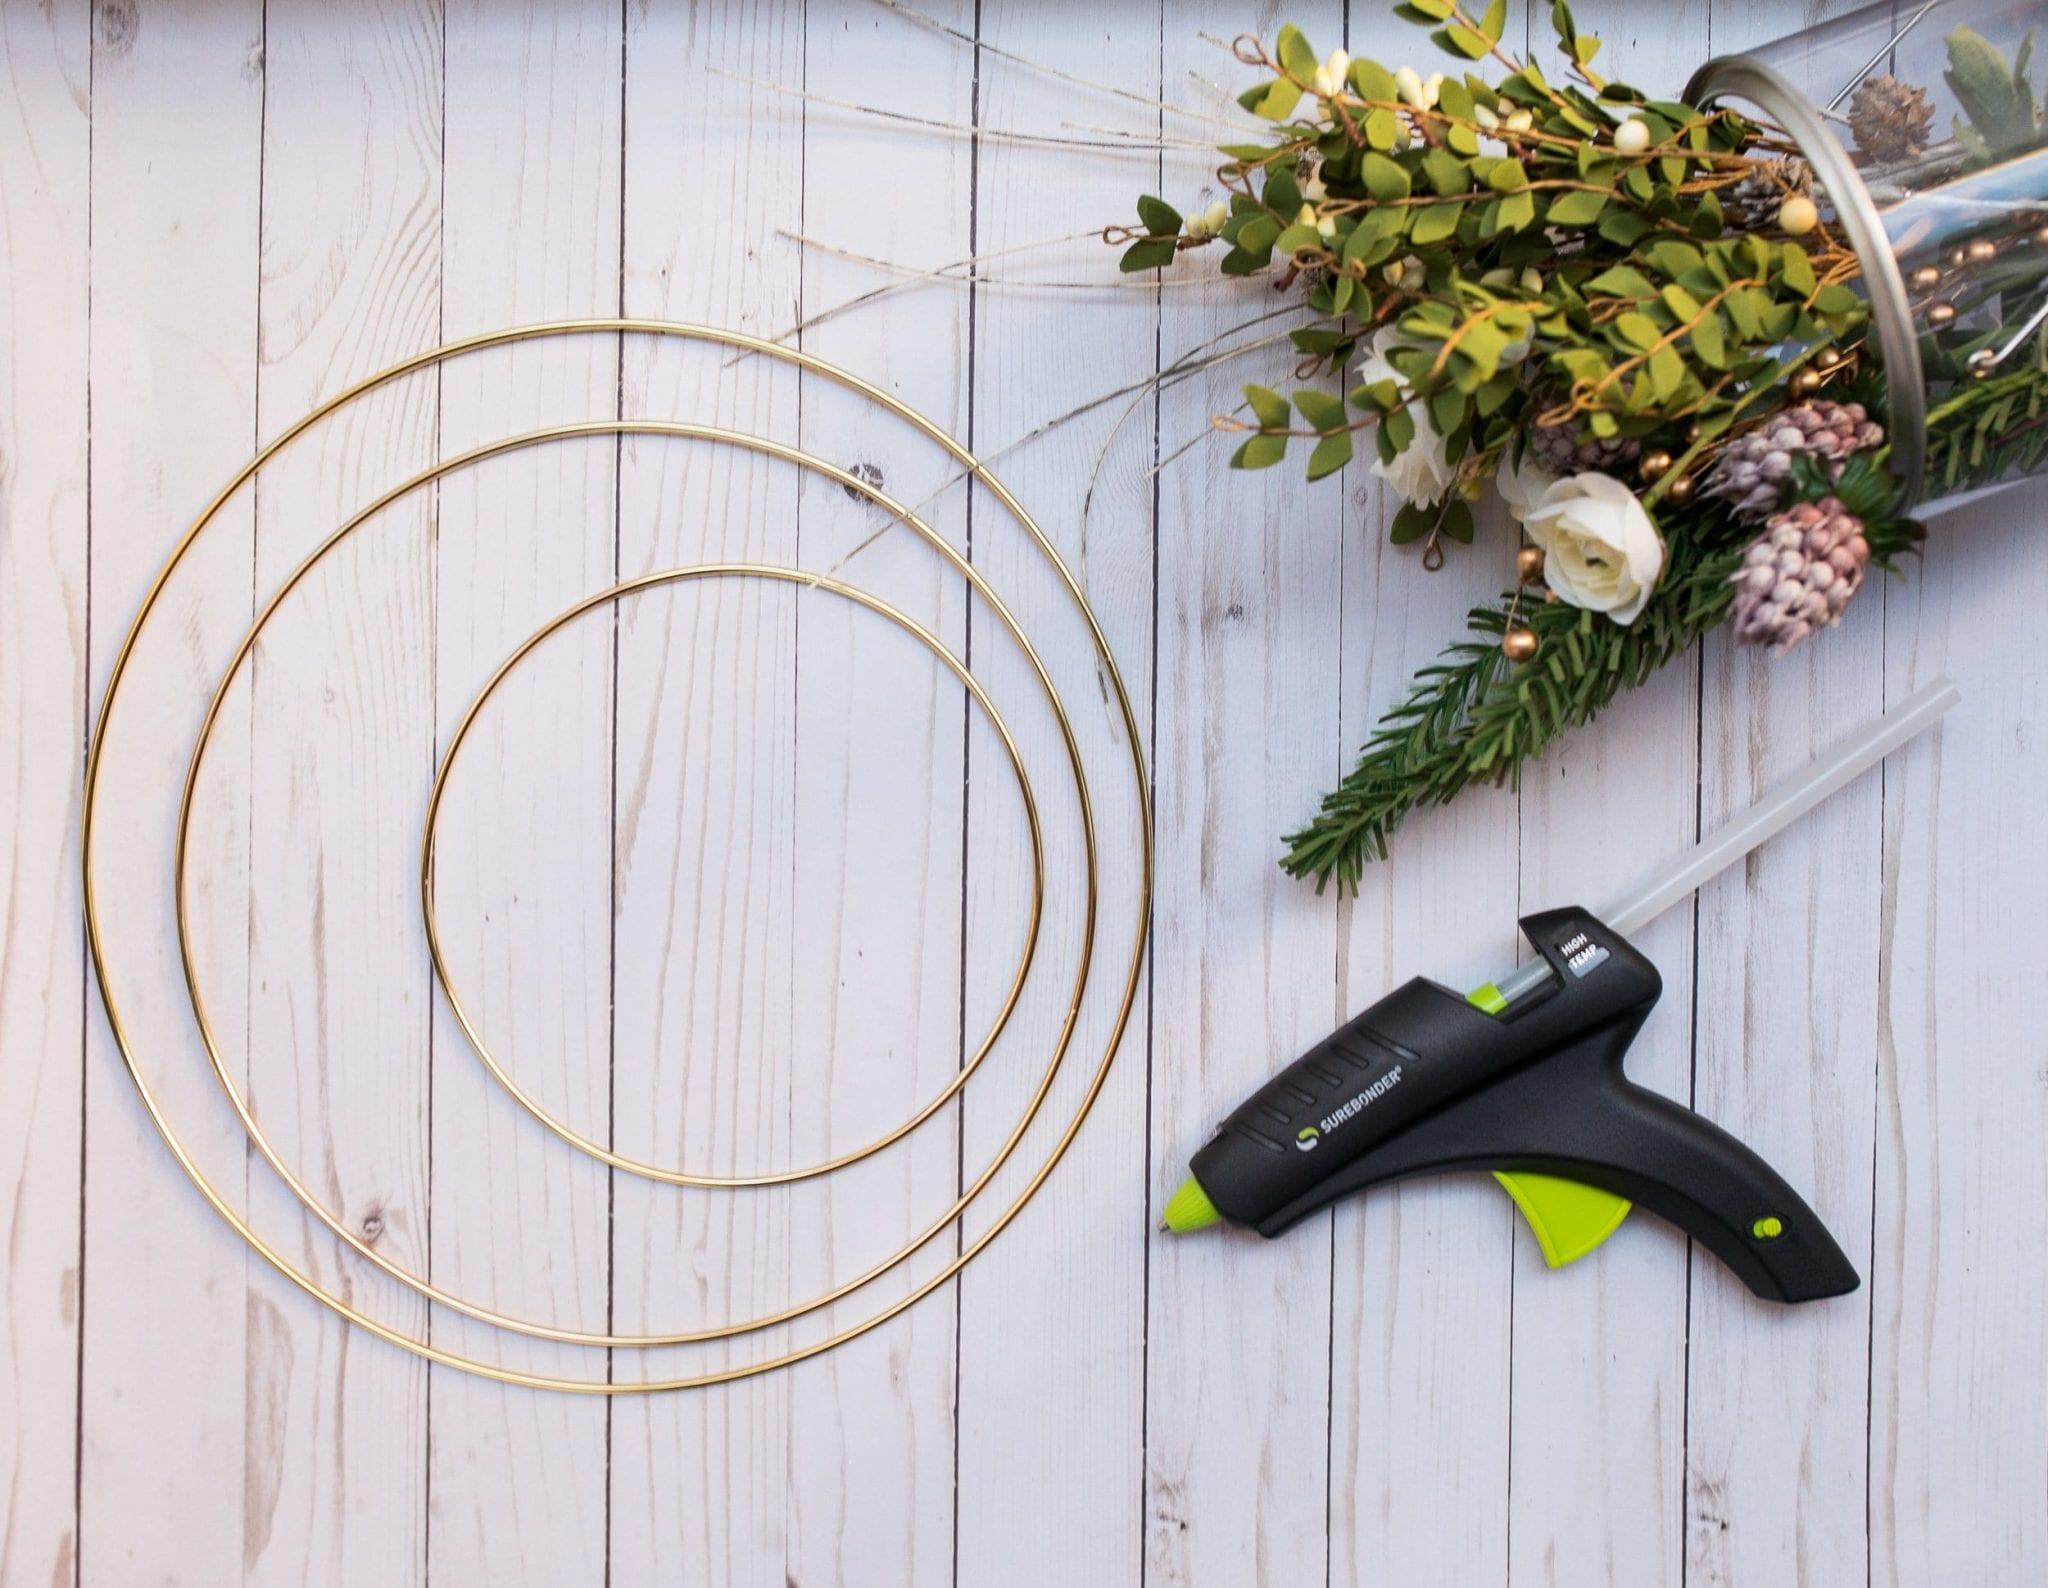 holiday wreaths diy christmas | christmas wreath gold hoop | how to make simple christmas wreath | christmas decor modern simple| holiday wreaths diy christmas simple| never skip brunch by cara newhart #decor #christmas #holiday